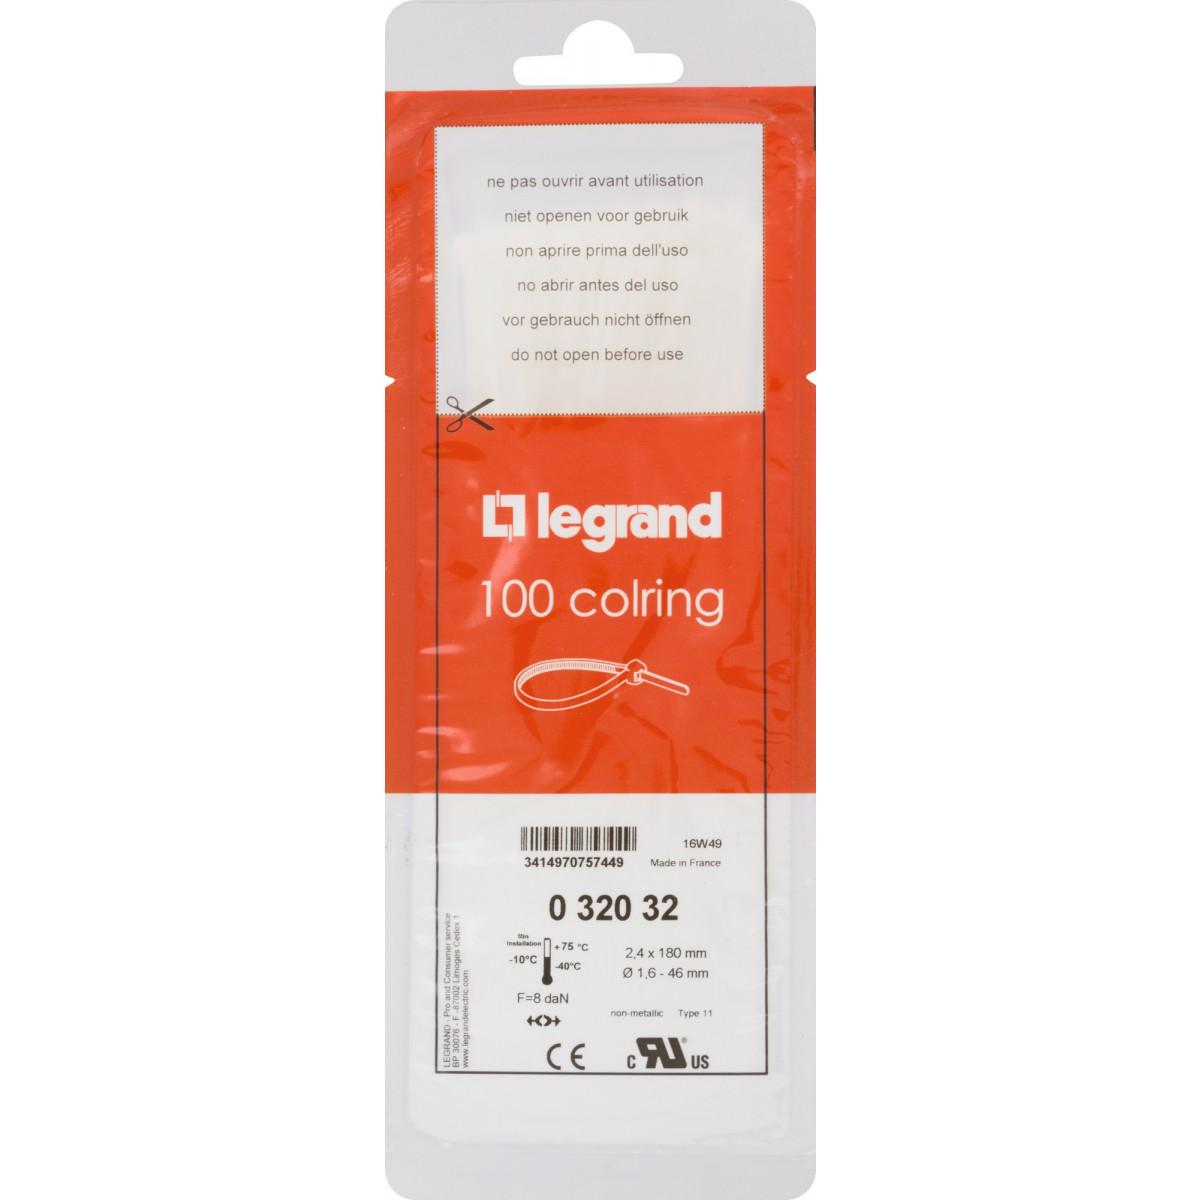 Collier Colring incolore Legrand - Dimensions 180 x 2,4 x 46 mm - Vendu par 100